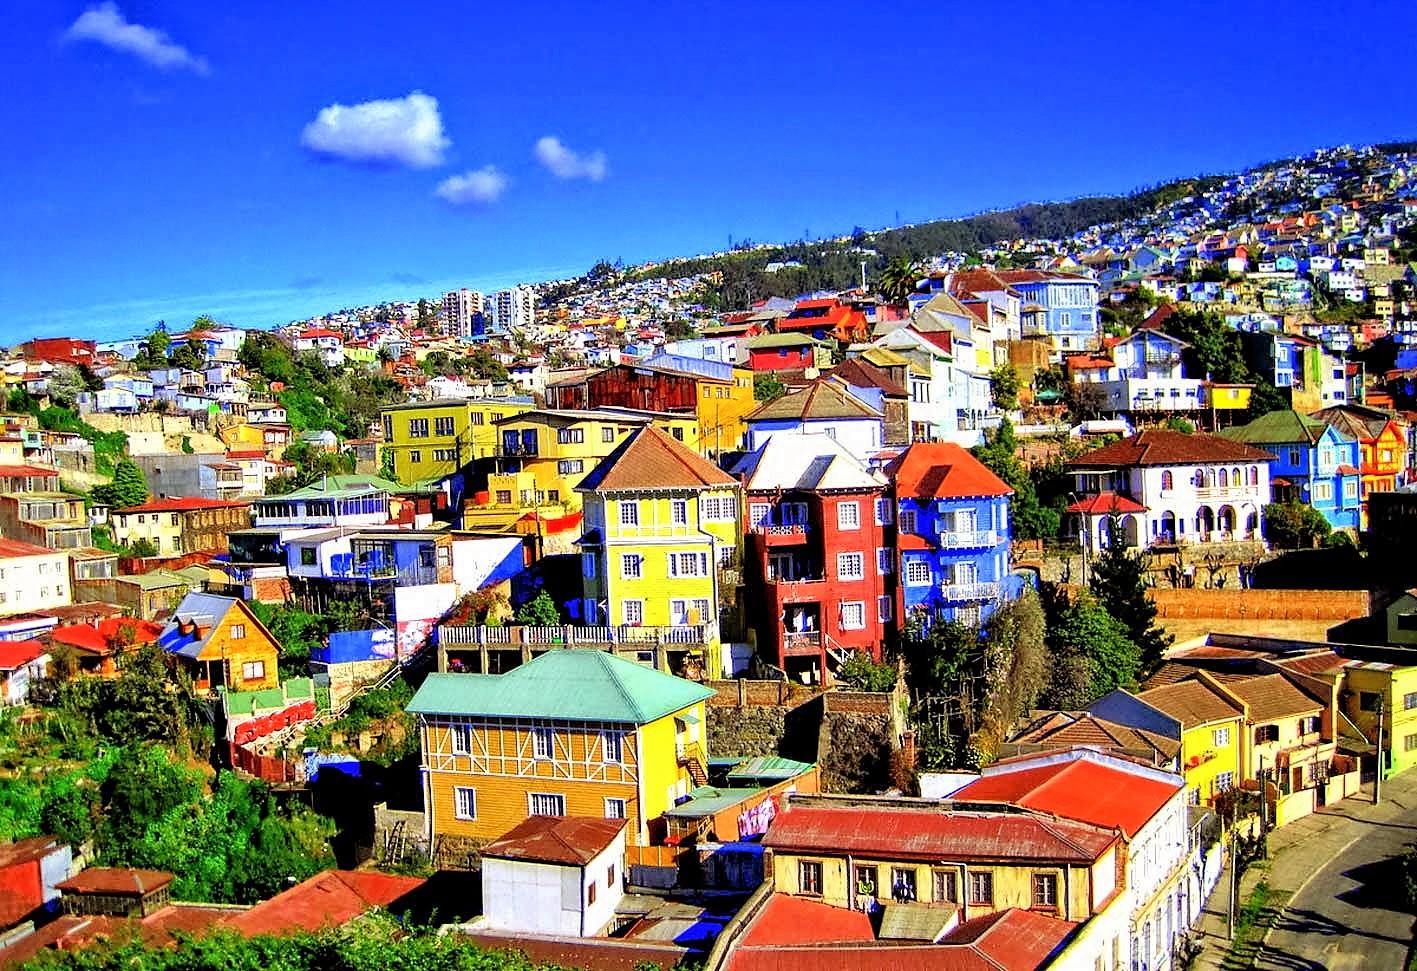 1600 Sf To Sm 5 Five 5 Valparaiso Chile